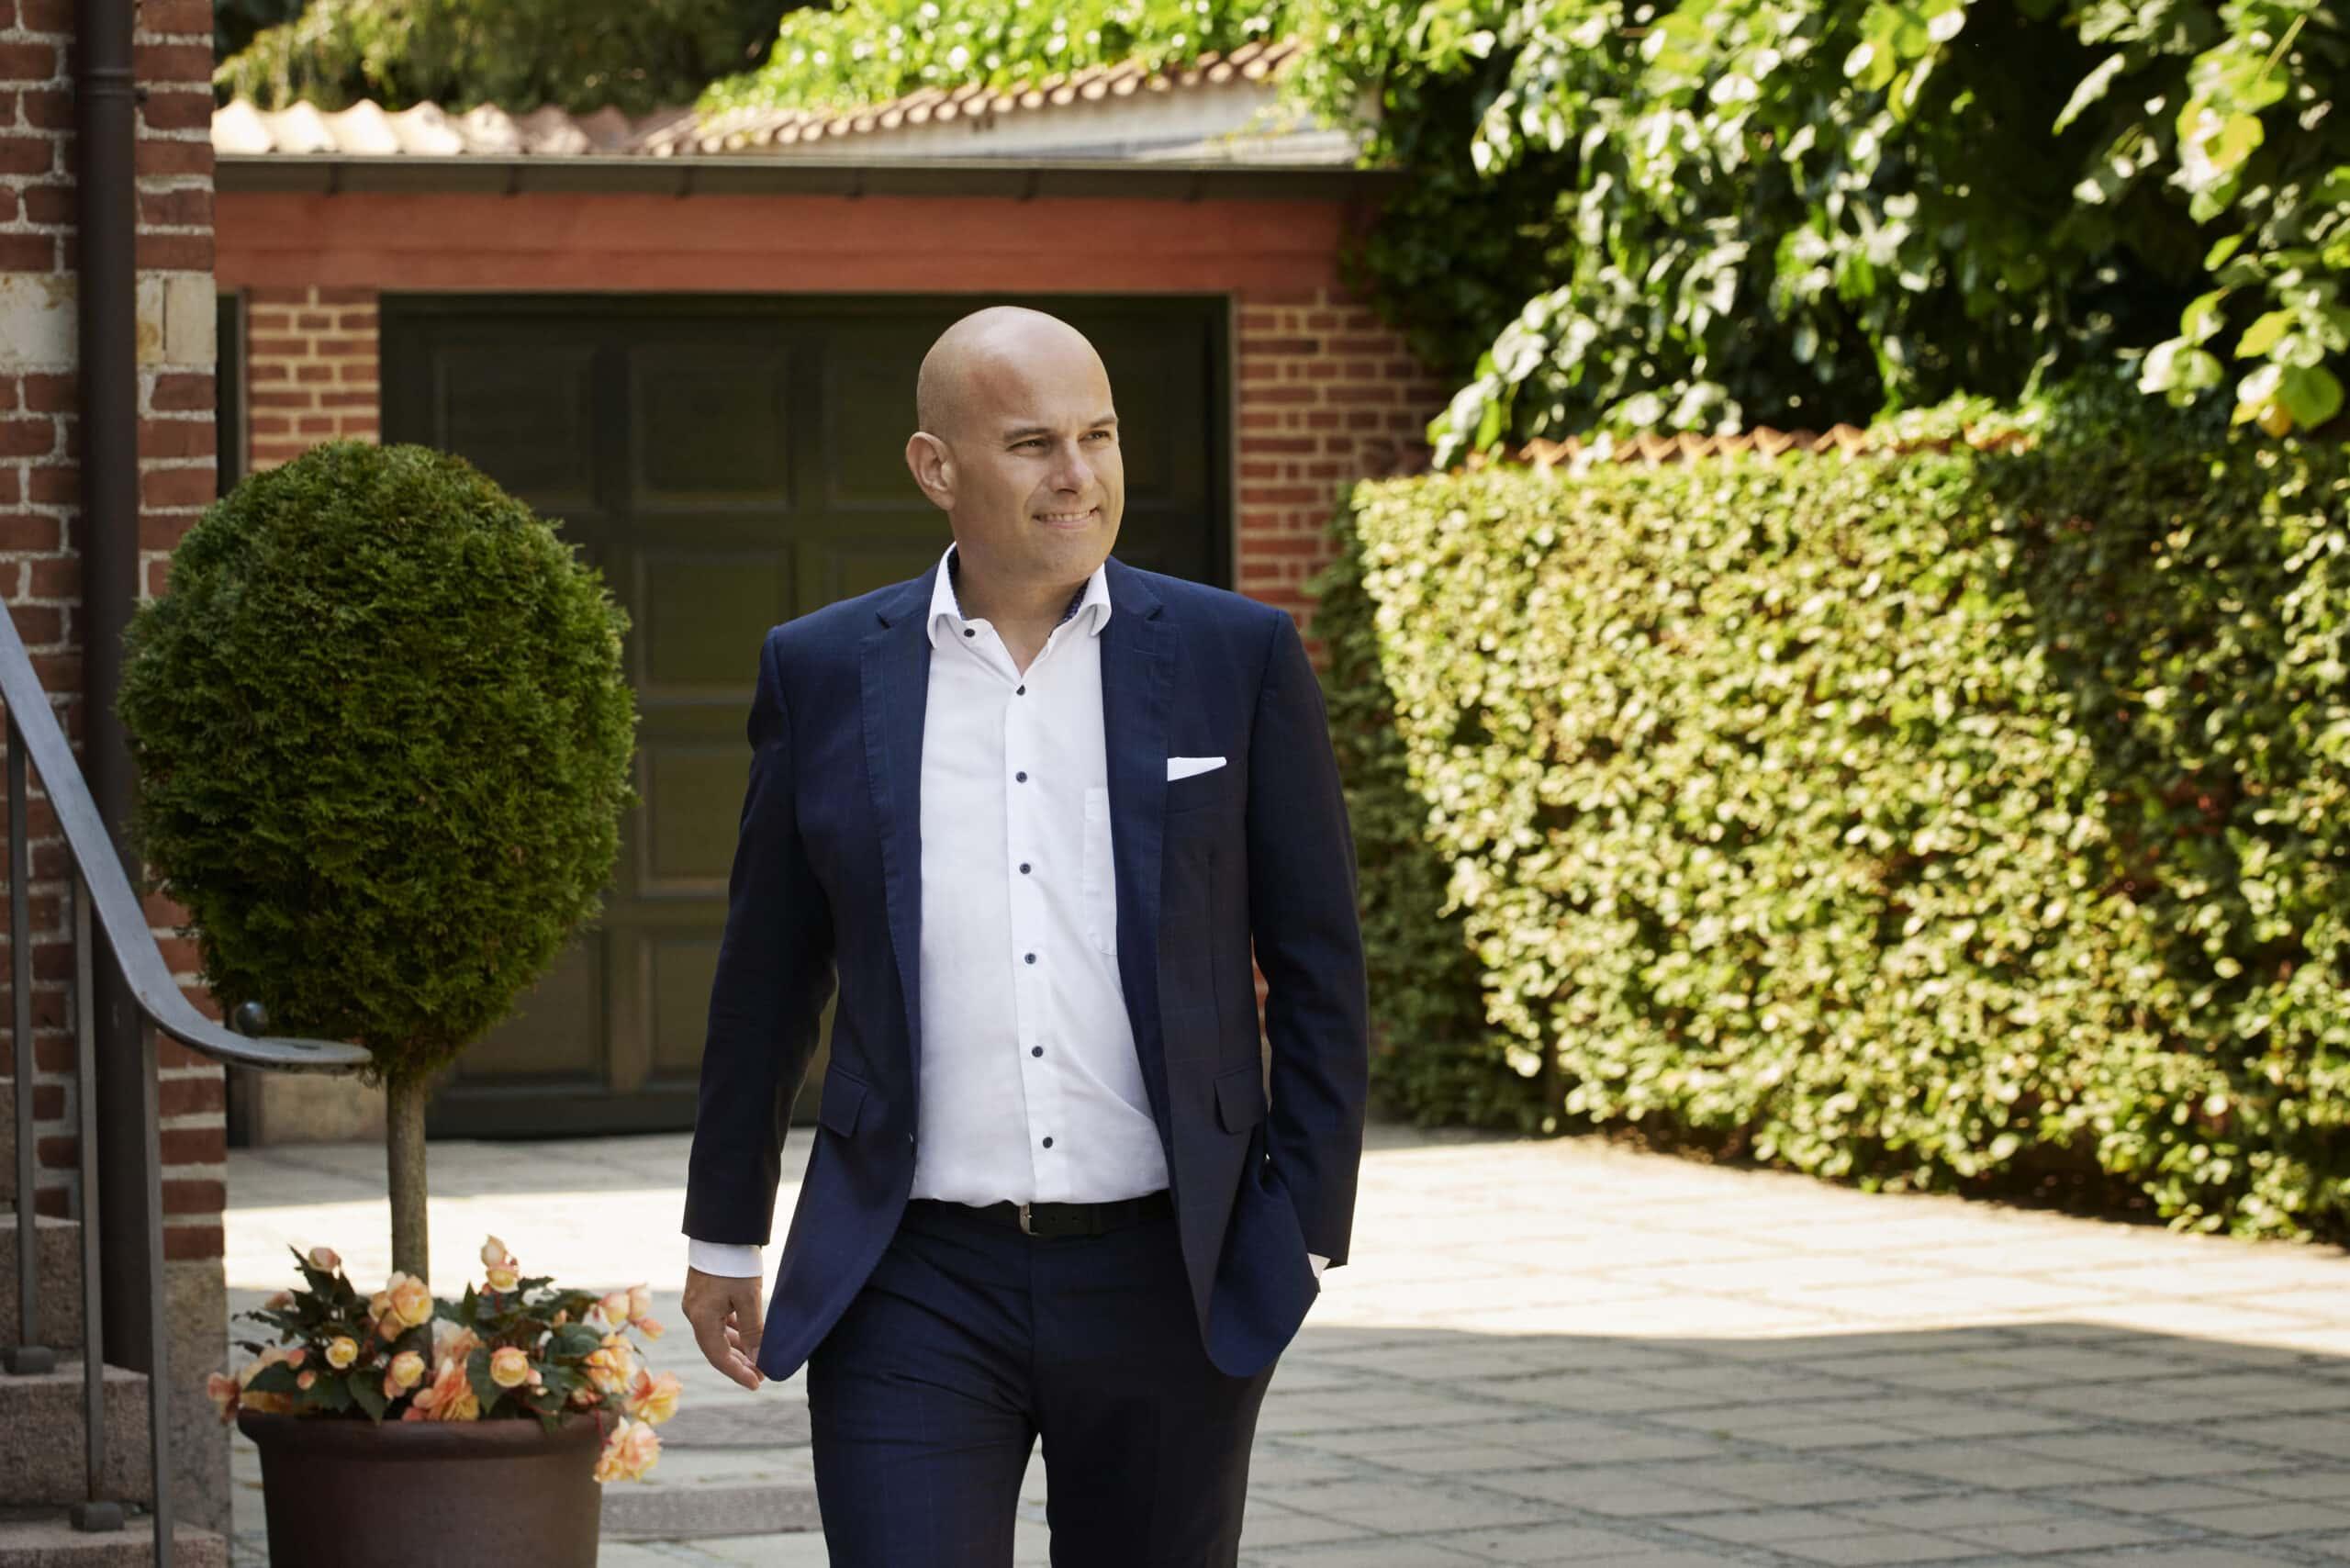 Martin Høyer-Hansen, Group CEO, North-East